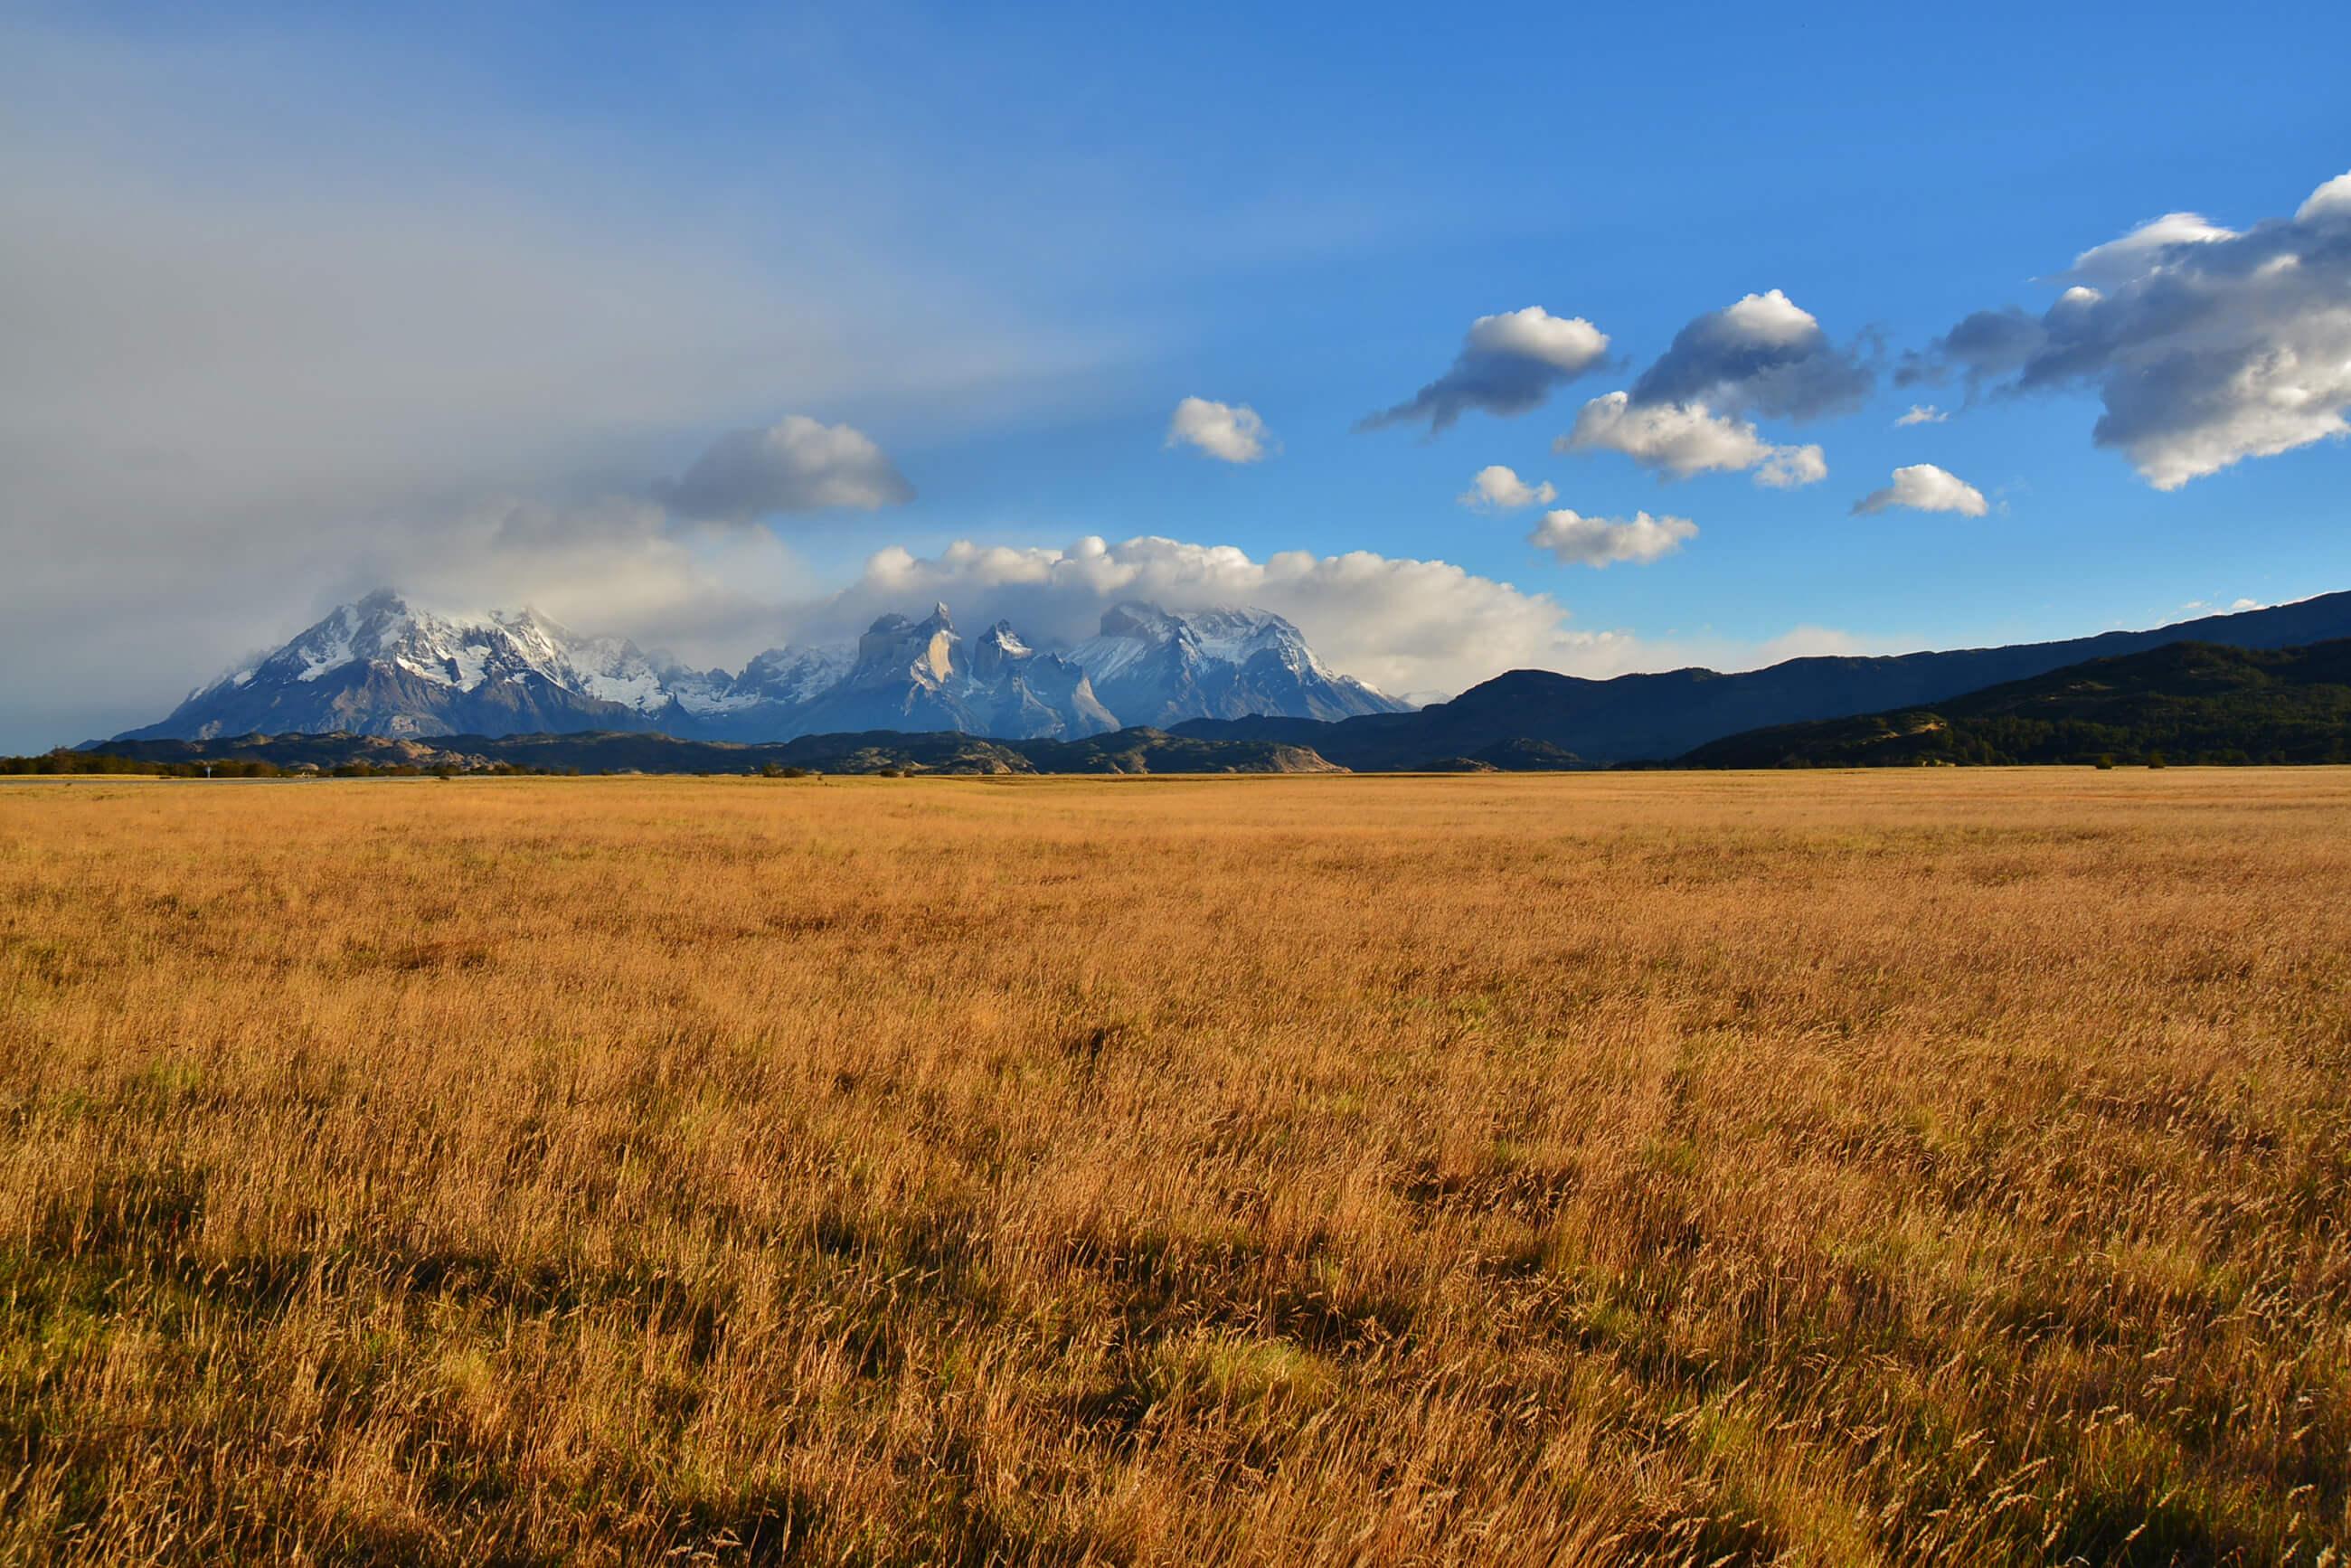 https://bubo.sk/uploads/galleries/5016/patagonia-chile-mirka-sulka-61-.jpg